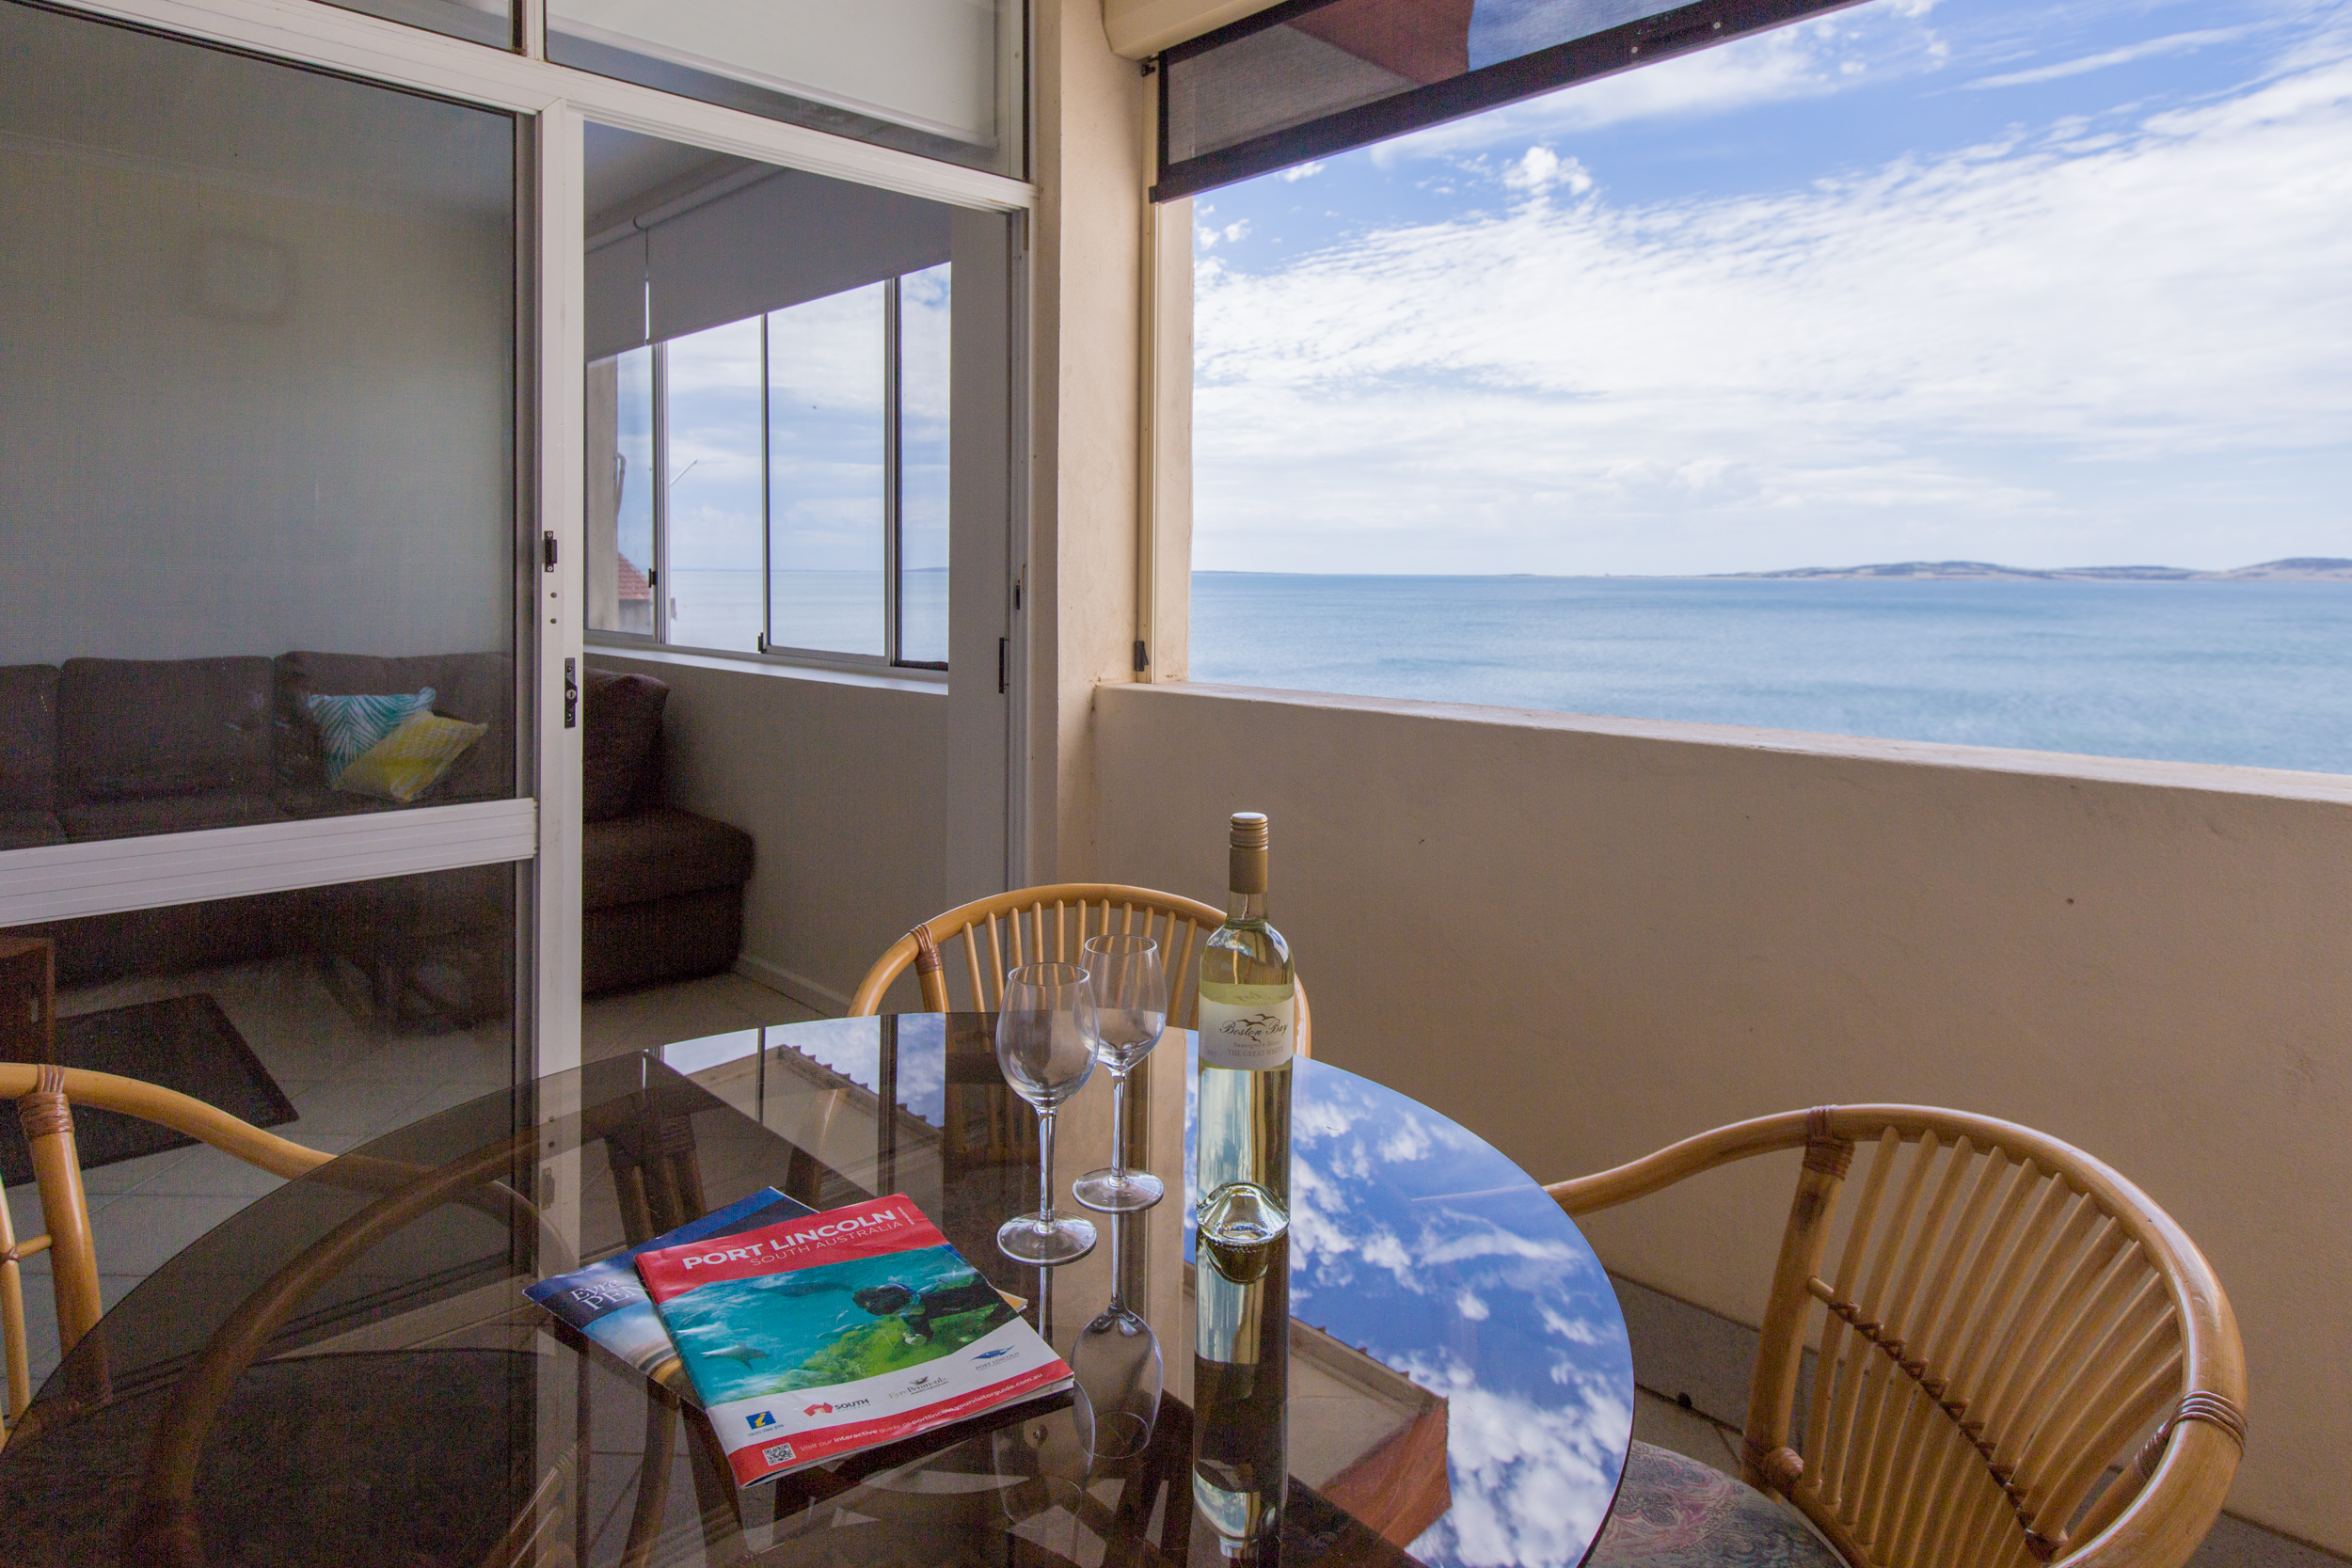 Visit Port Lincoln Accommodation